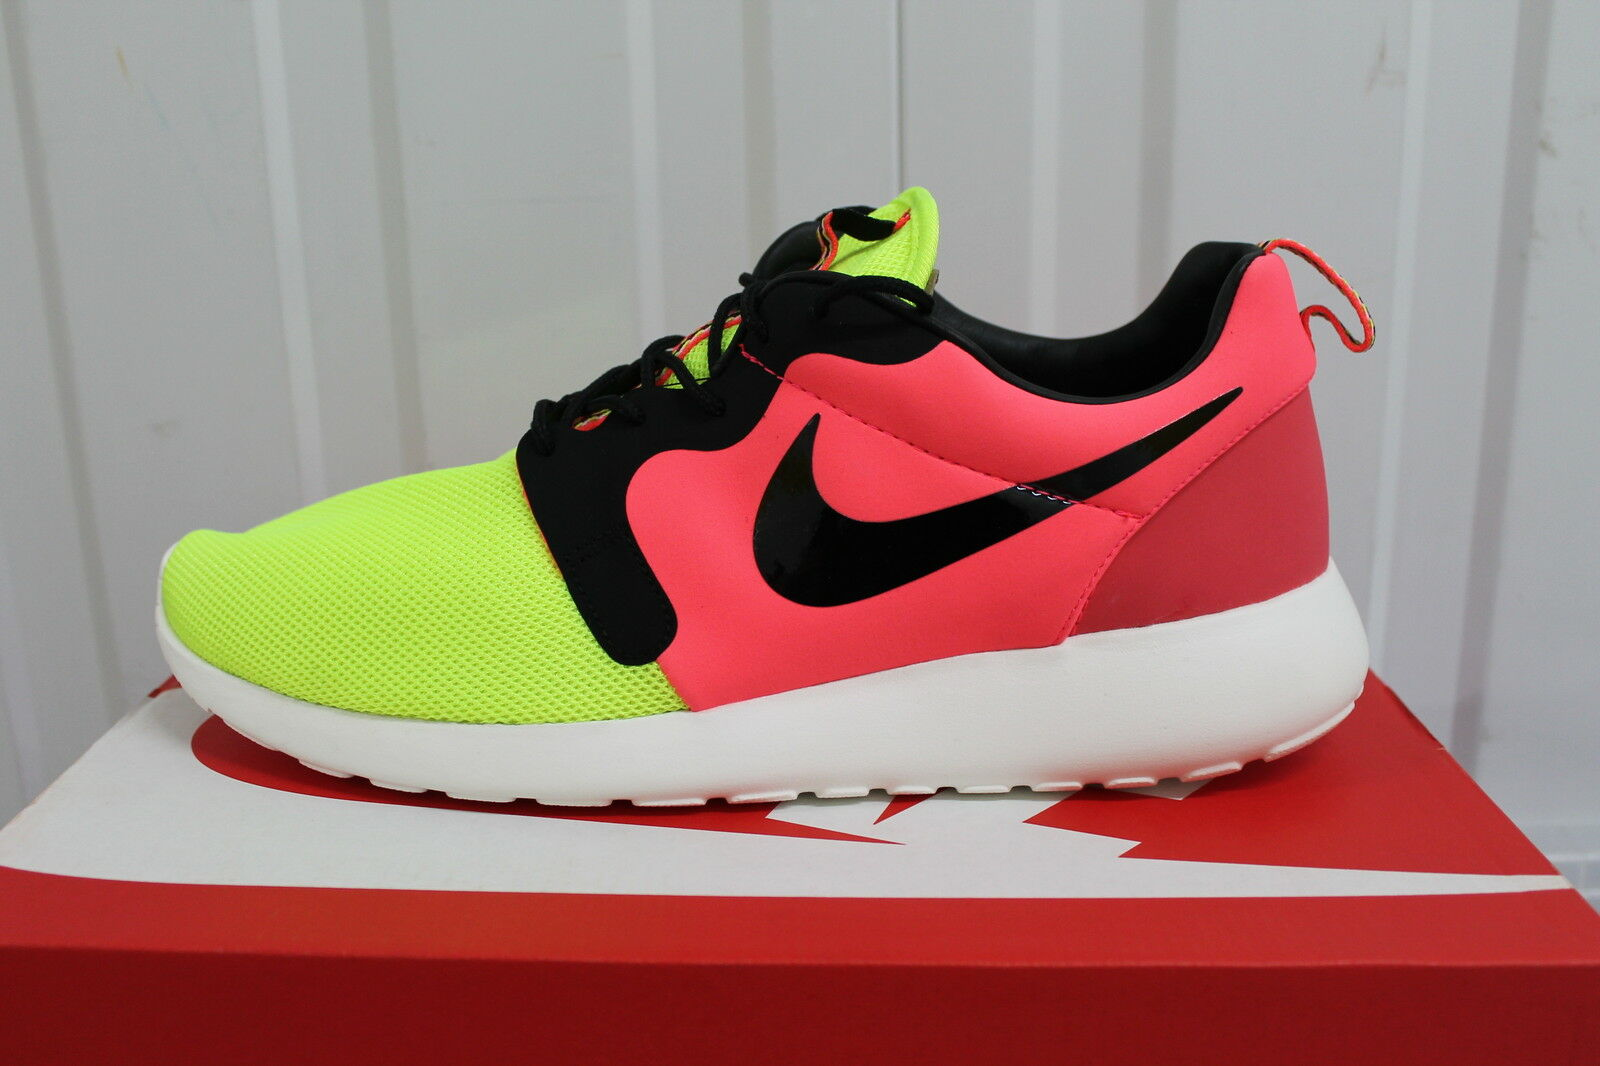 NIKE ROSHERUN HYPER PREMUIM MEN,S Price reduction 669689-700 Price reduction The most popular shoes for men and women